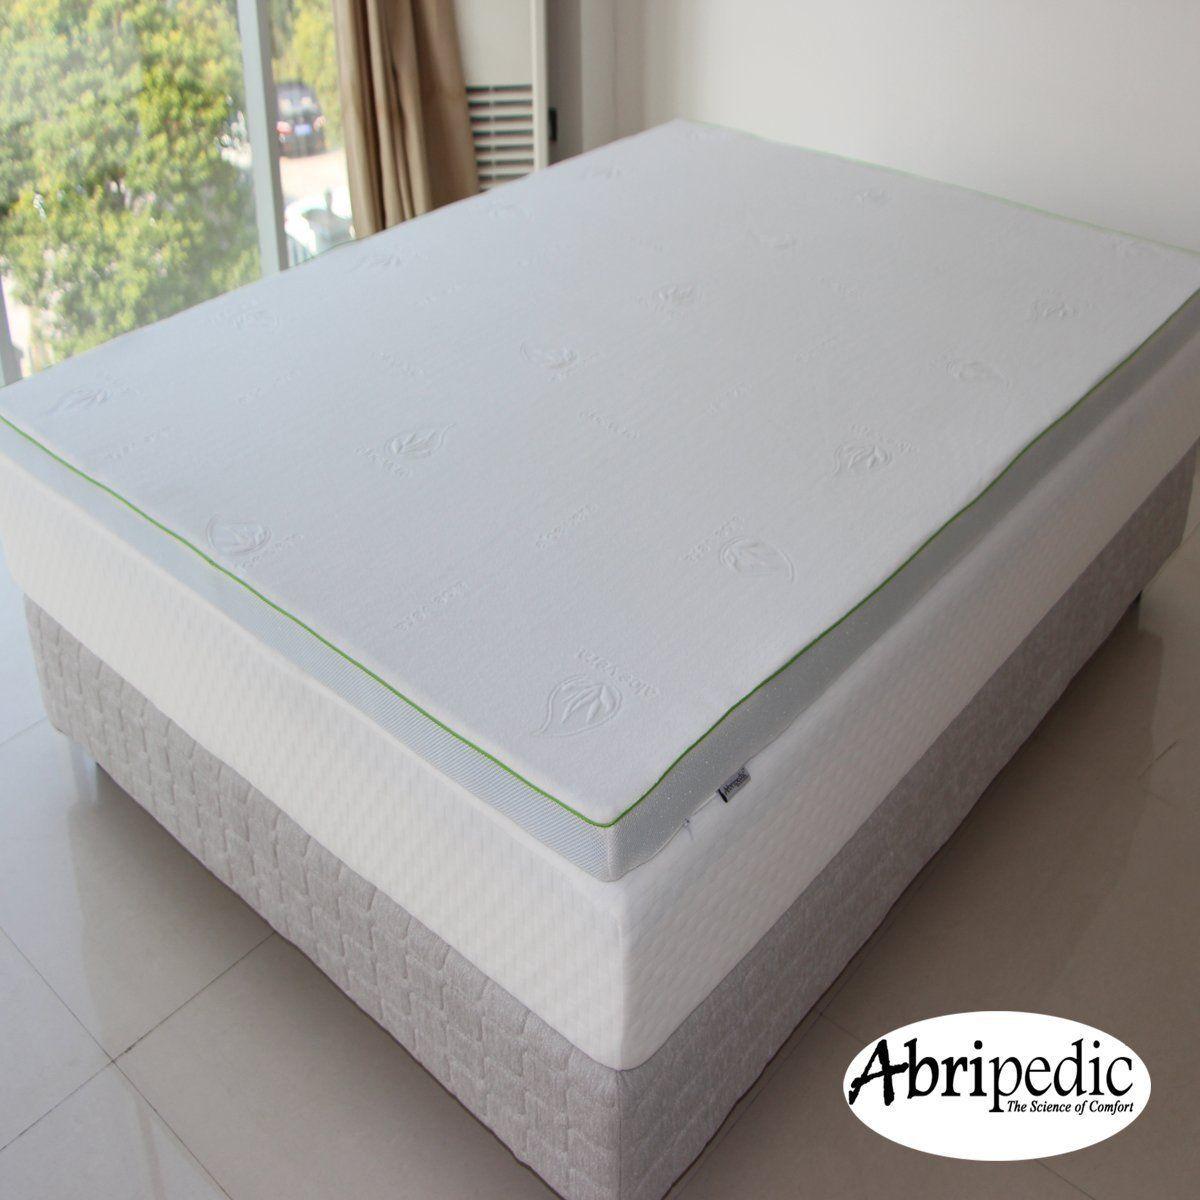 aussy crafted wool mattress pads for babies mattress pad and mattress